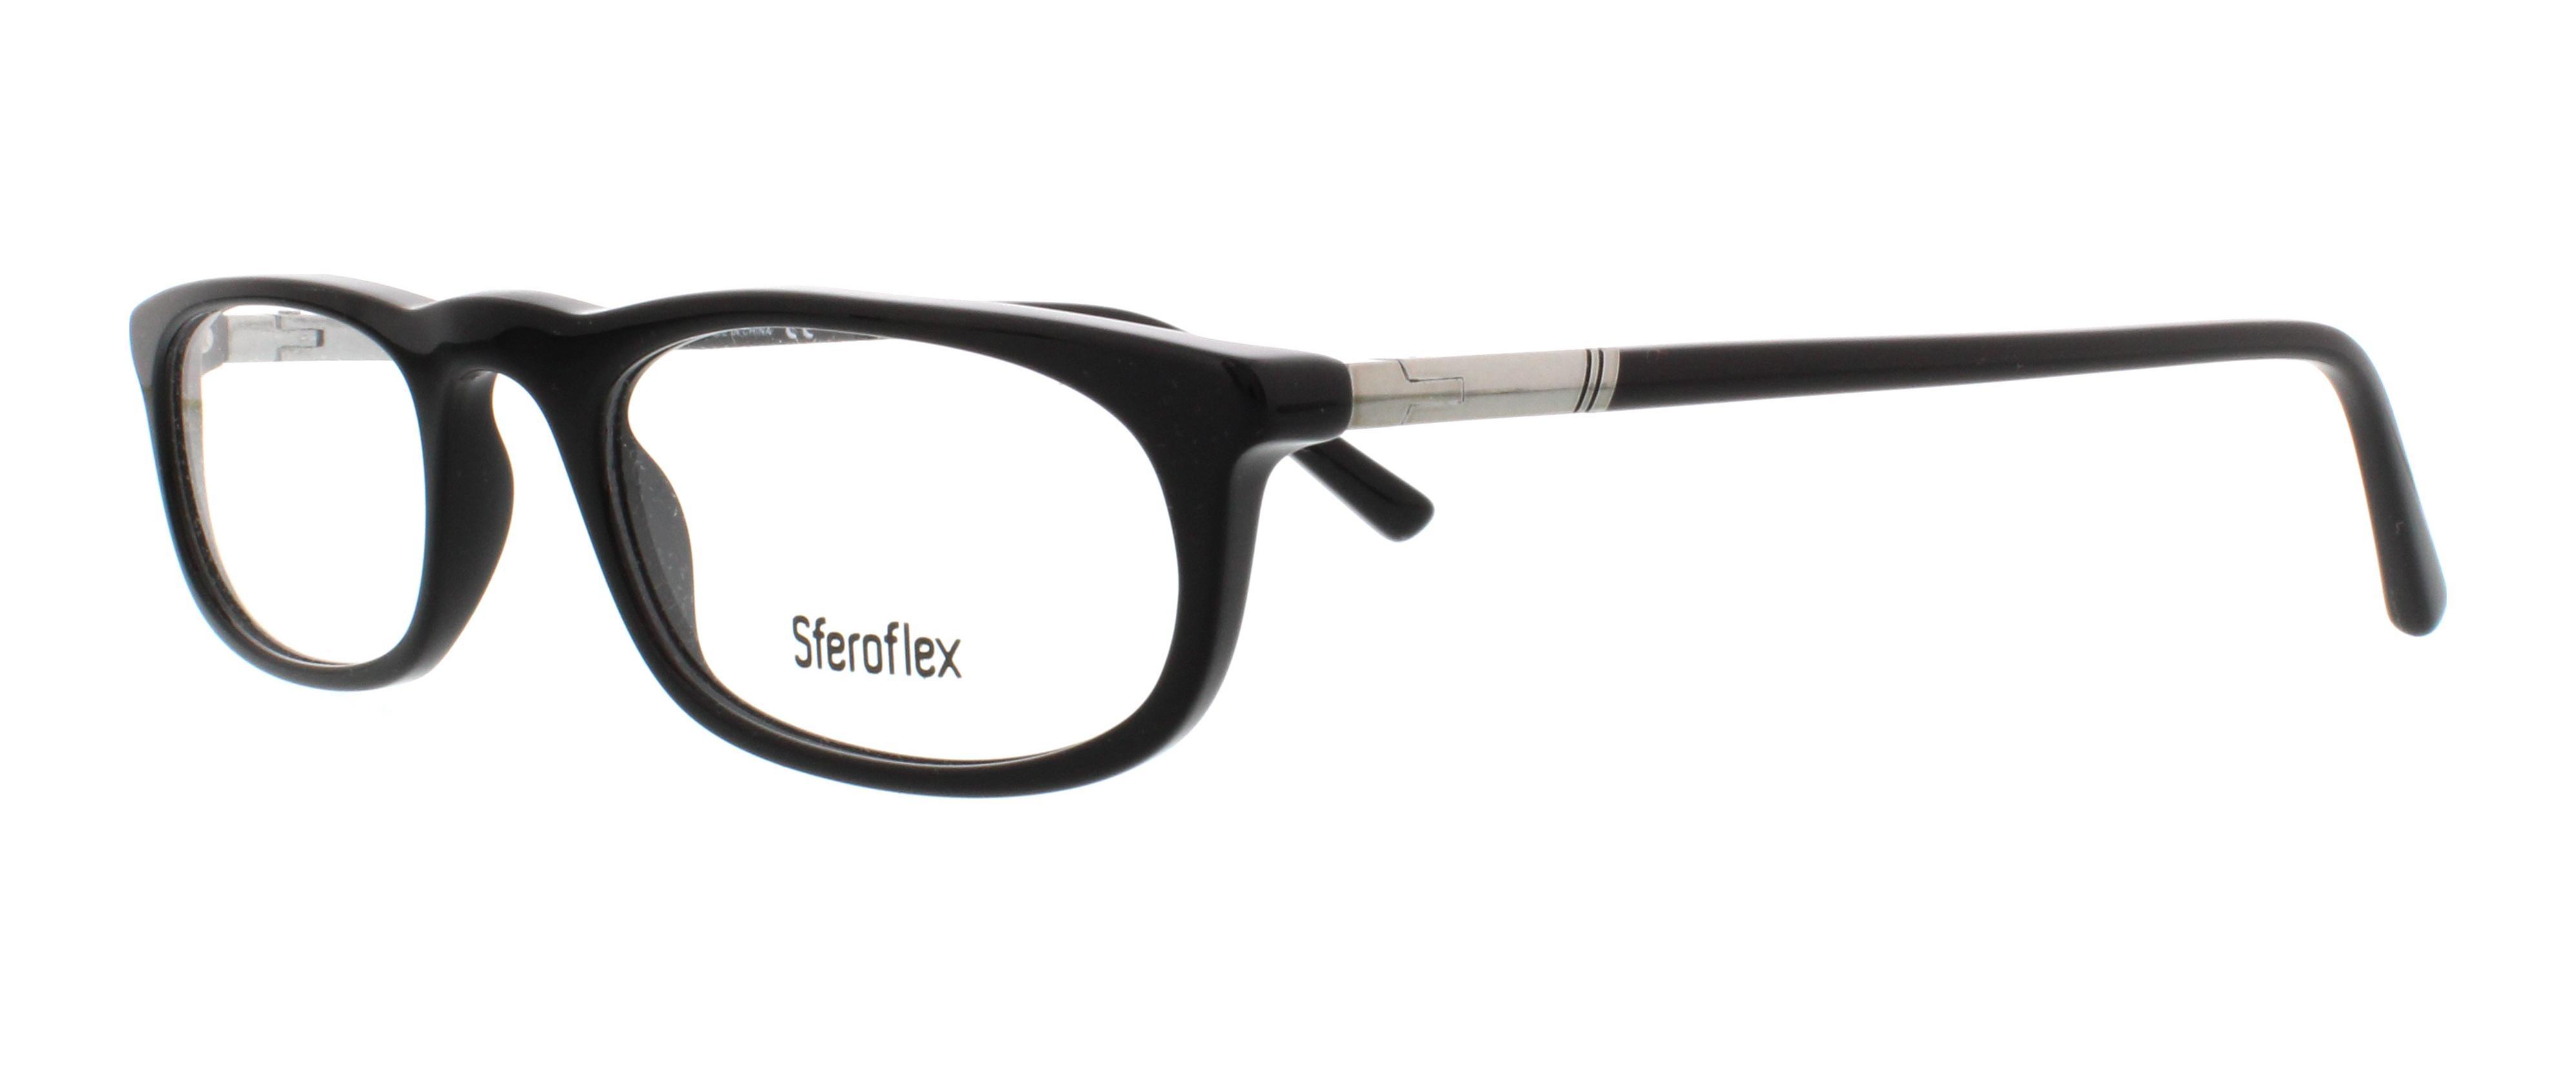 SFEROFLEX Eyeglasses SF1137 C568 Black 52MM 8053672042535 | eBay